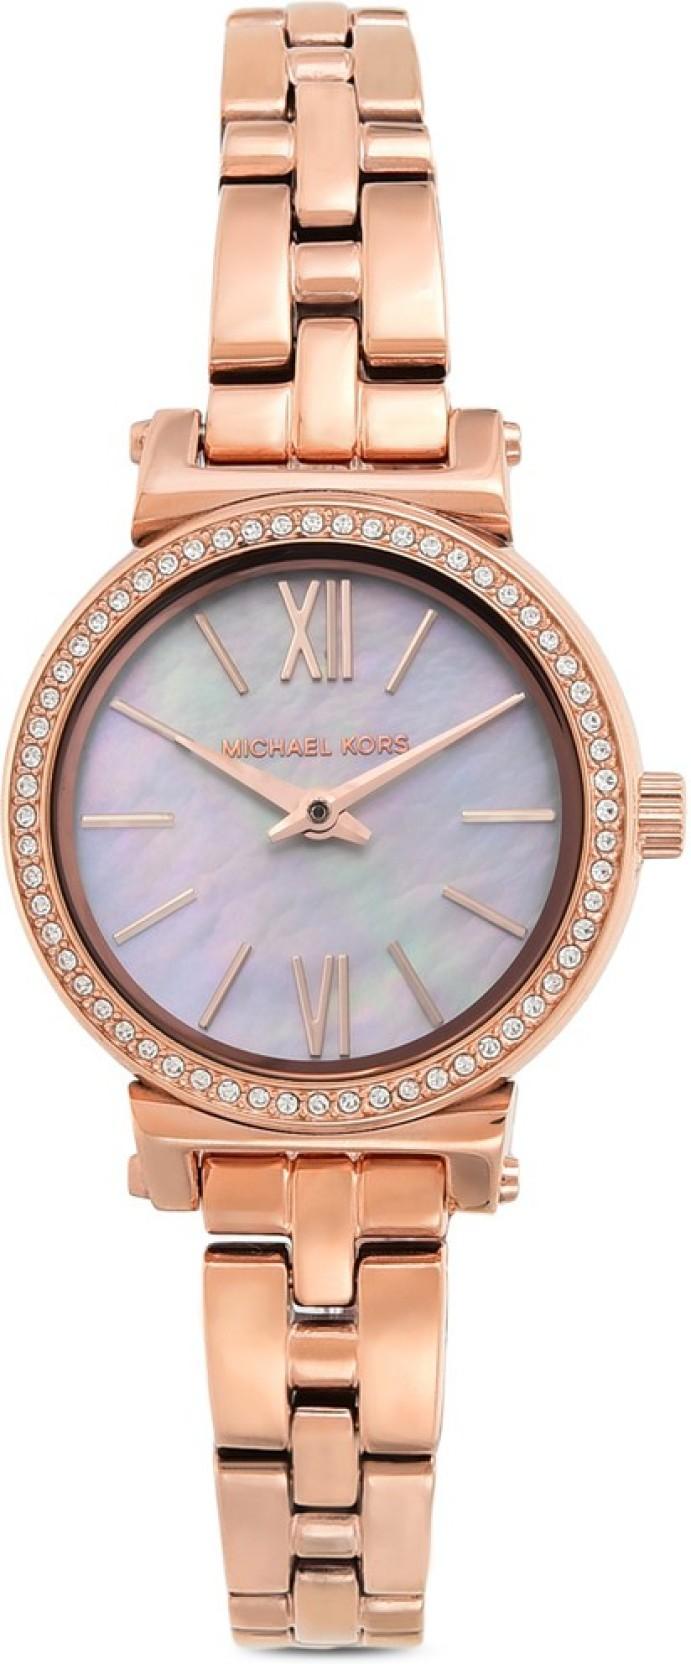 047b6f91af9a Michael Kors MK3833 SOFIE Watch - For Women - Buy Michael Kors ...